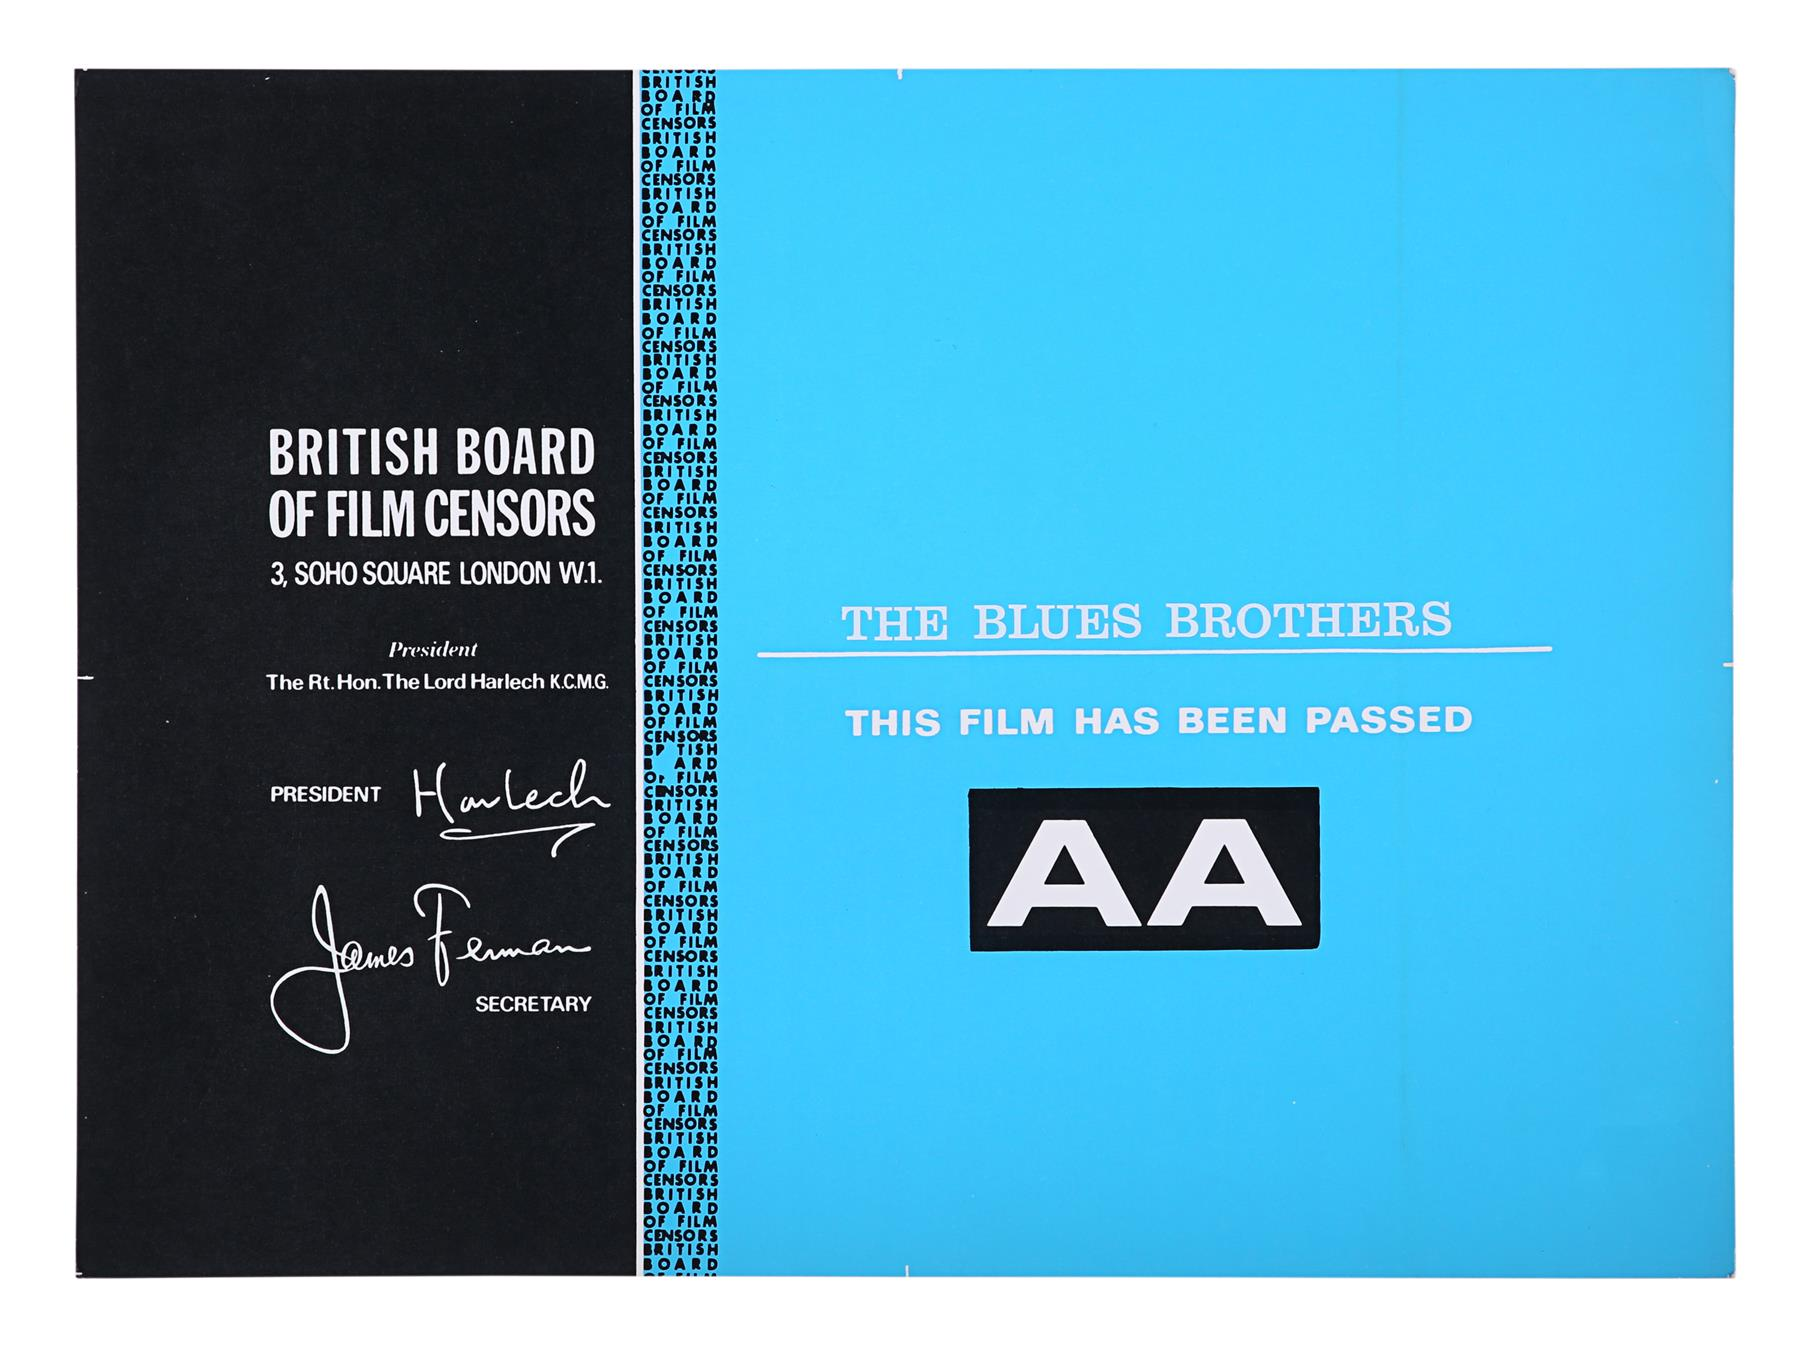 THE BLUES BROTHERS (1980), ANIMAL HOUSE (1978) - BBFC Certificates John Landis, 1978, 1980 - Image 3 of 3